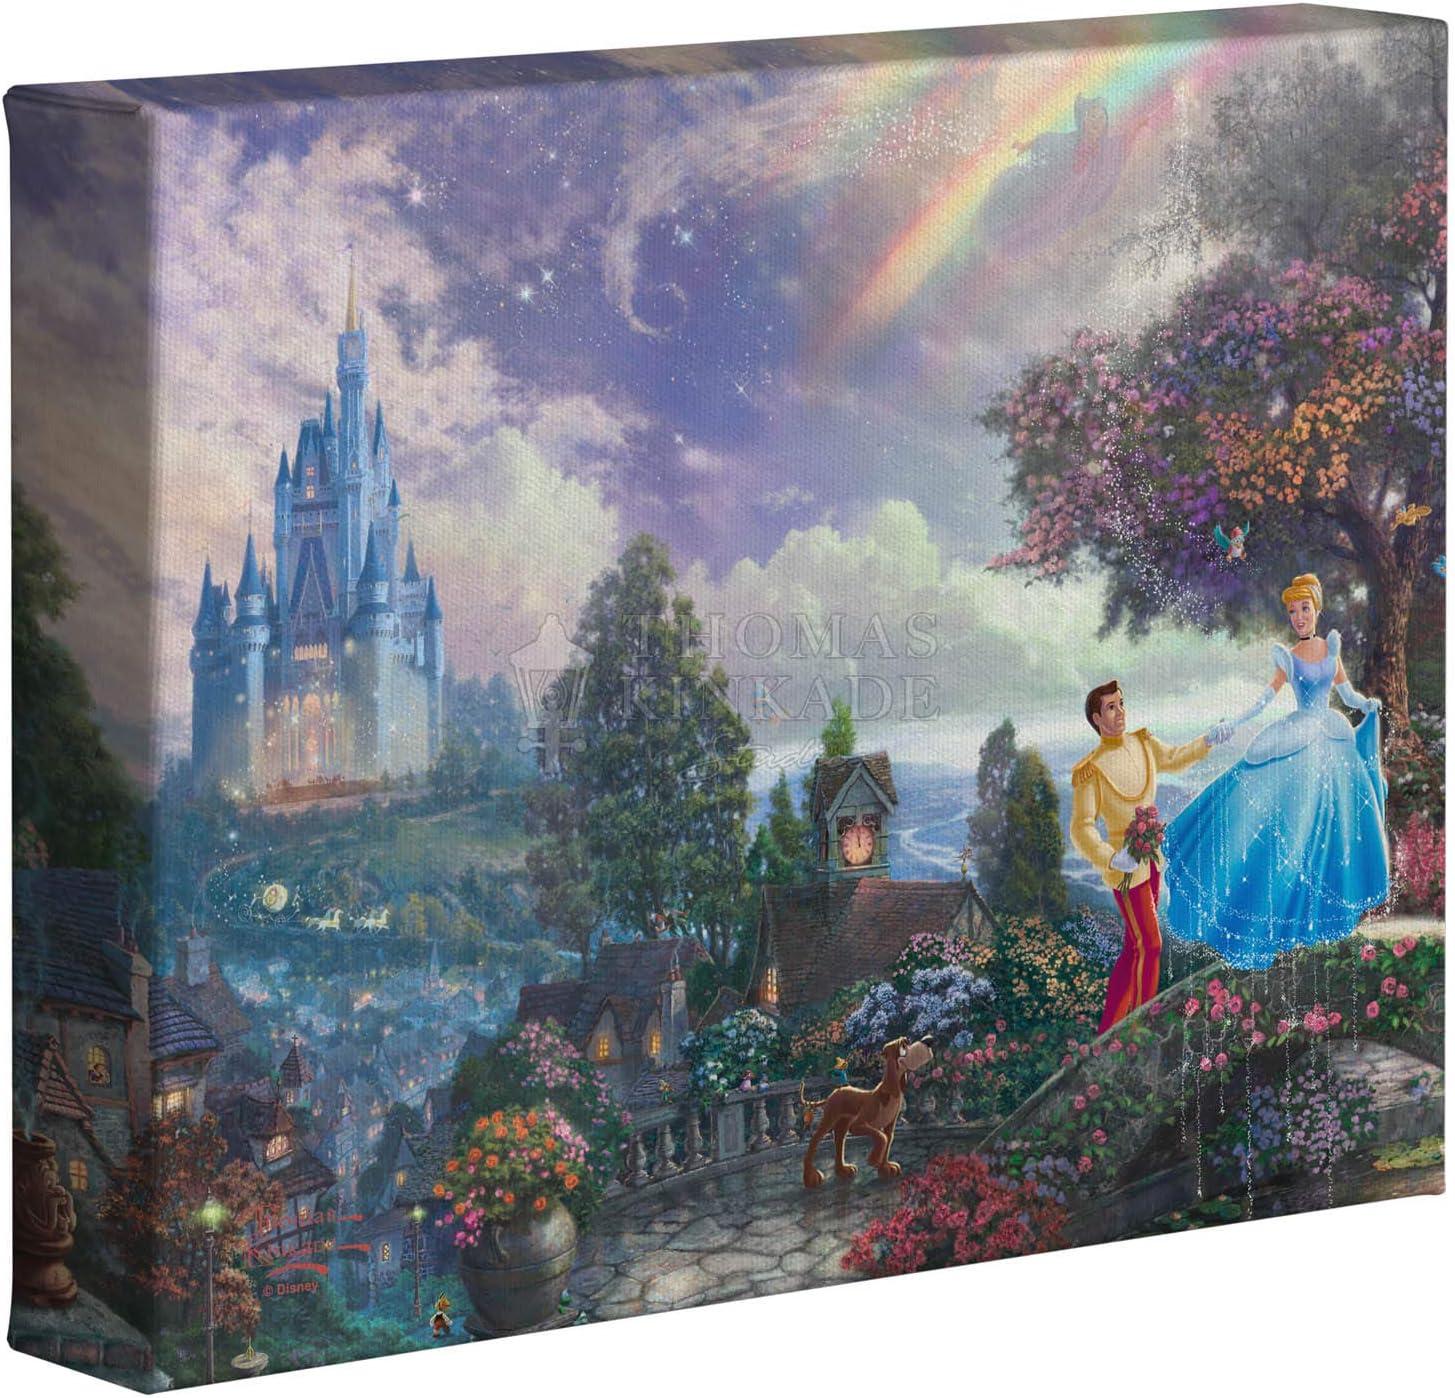 Thomas Kinkade Disney Cinderella Wishes Upon A Dream 8 x 10 Gallery Wrapped Canvas